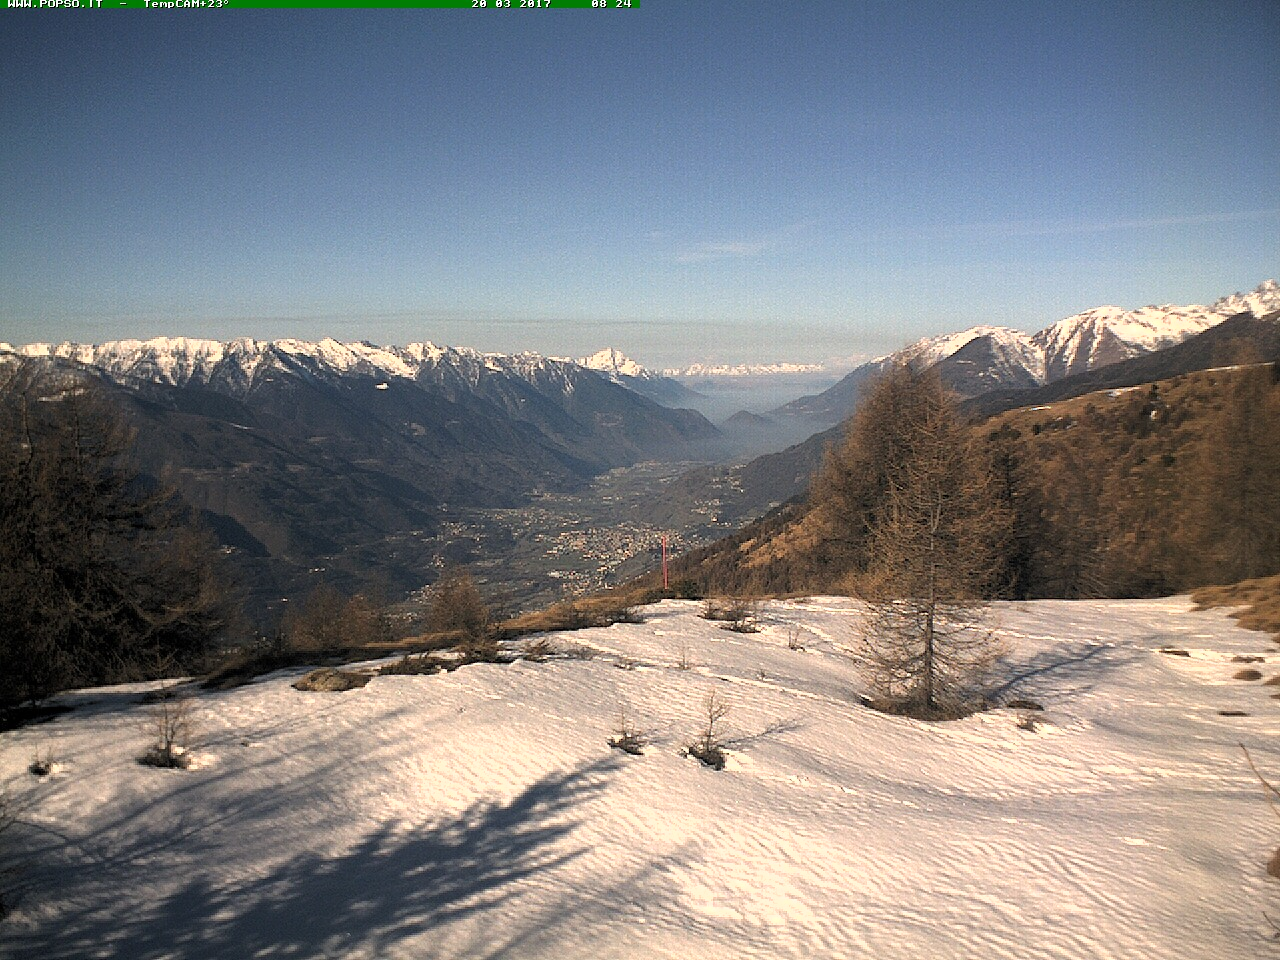 Valtellina, Valchiavenna, Orobie e Lario: MARZO 2017-prato_01.jpg